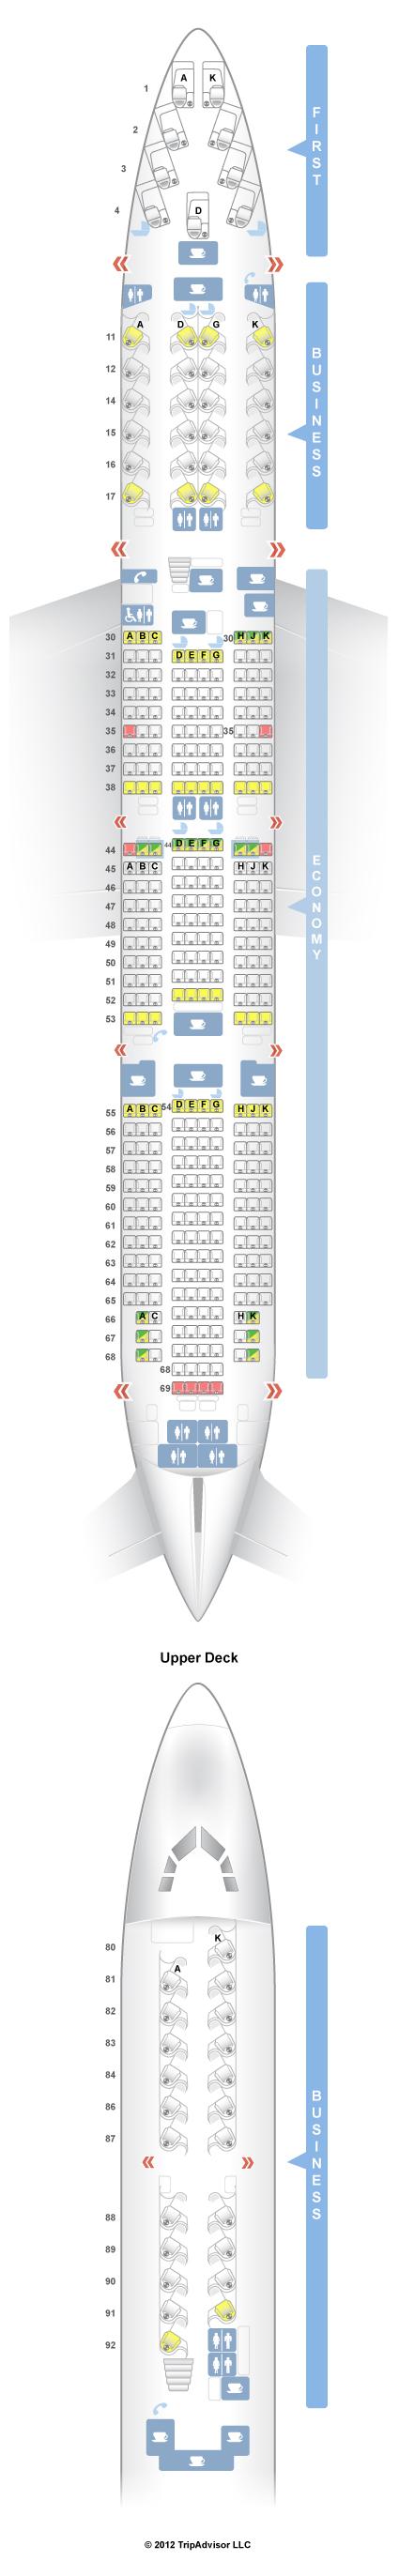 b77w seat map cathay pacific Seatguru Seat Map Cathay Pacific Seatguru b77w seat map cathay pacific